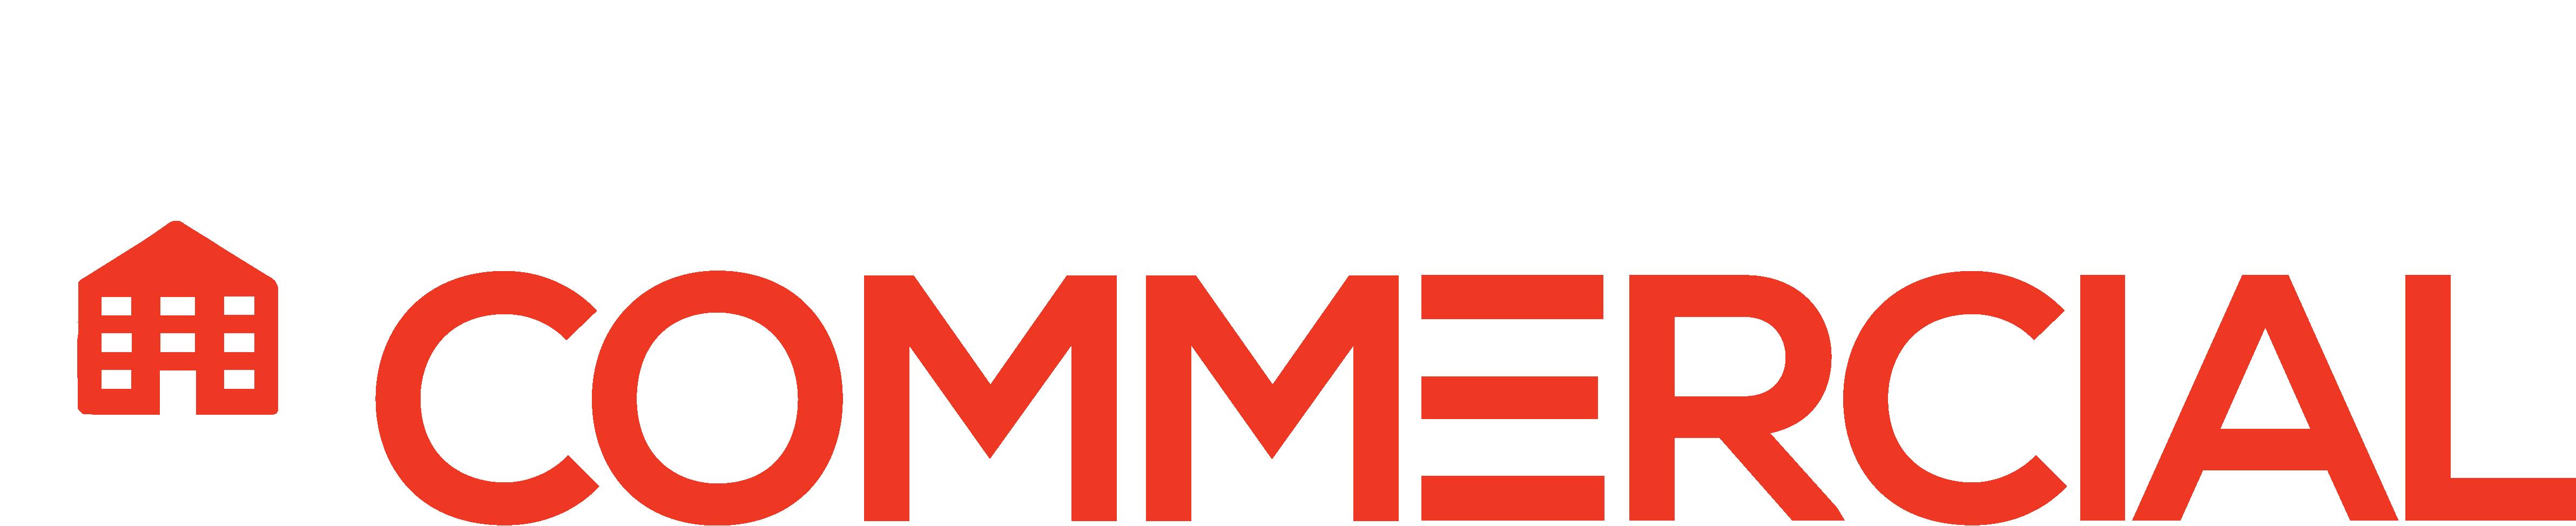 logo-img-commercial